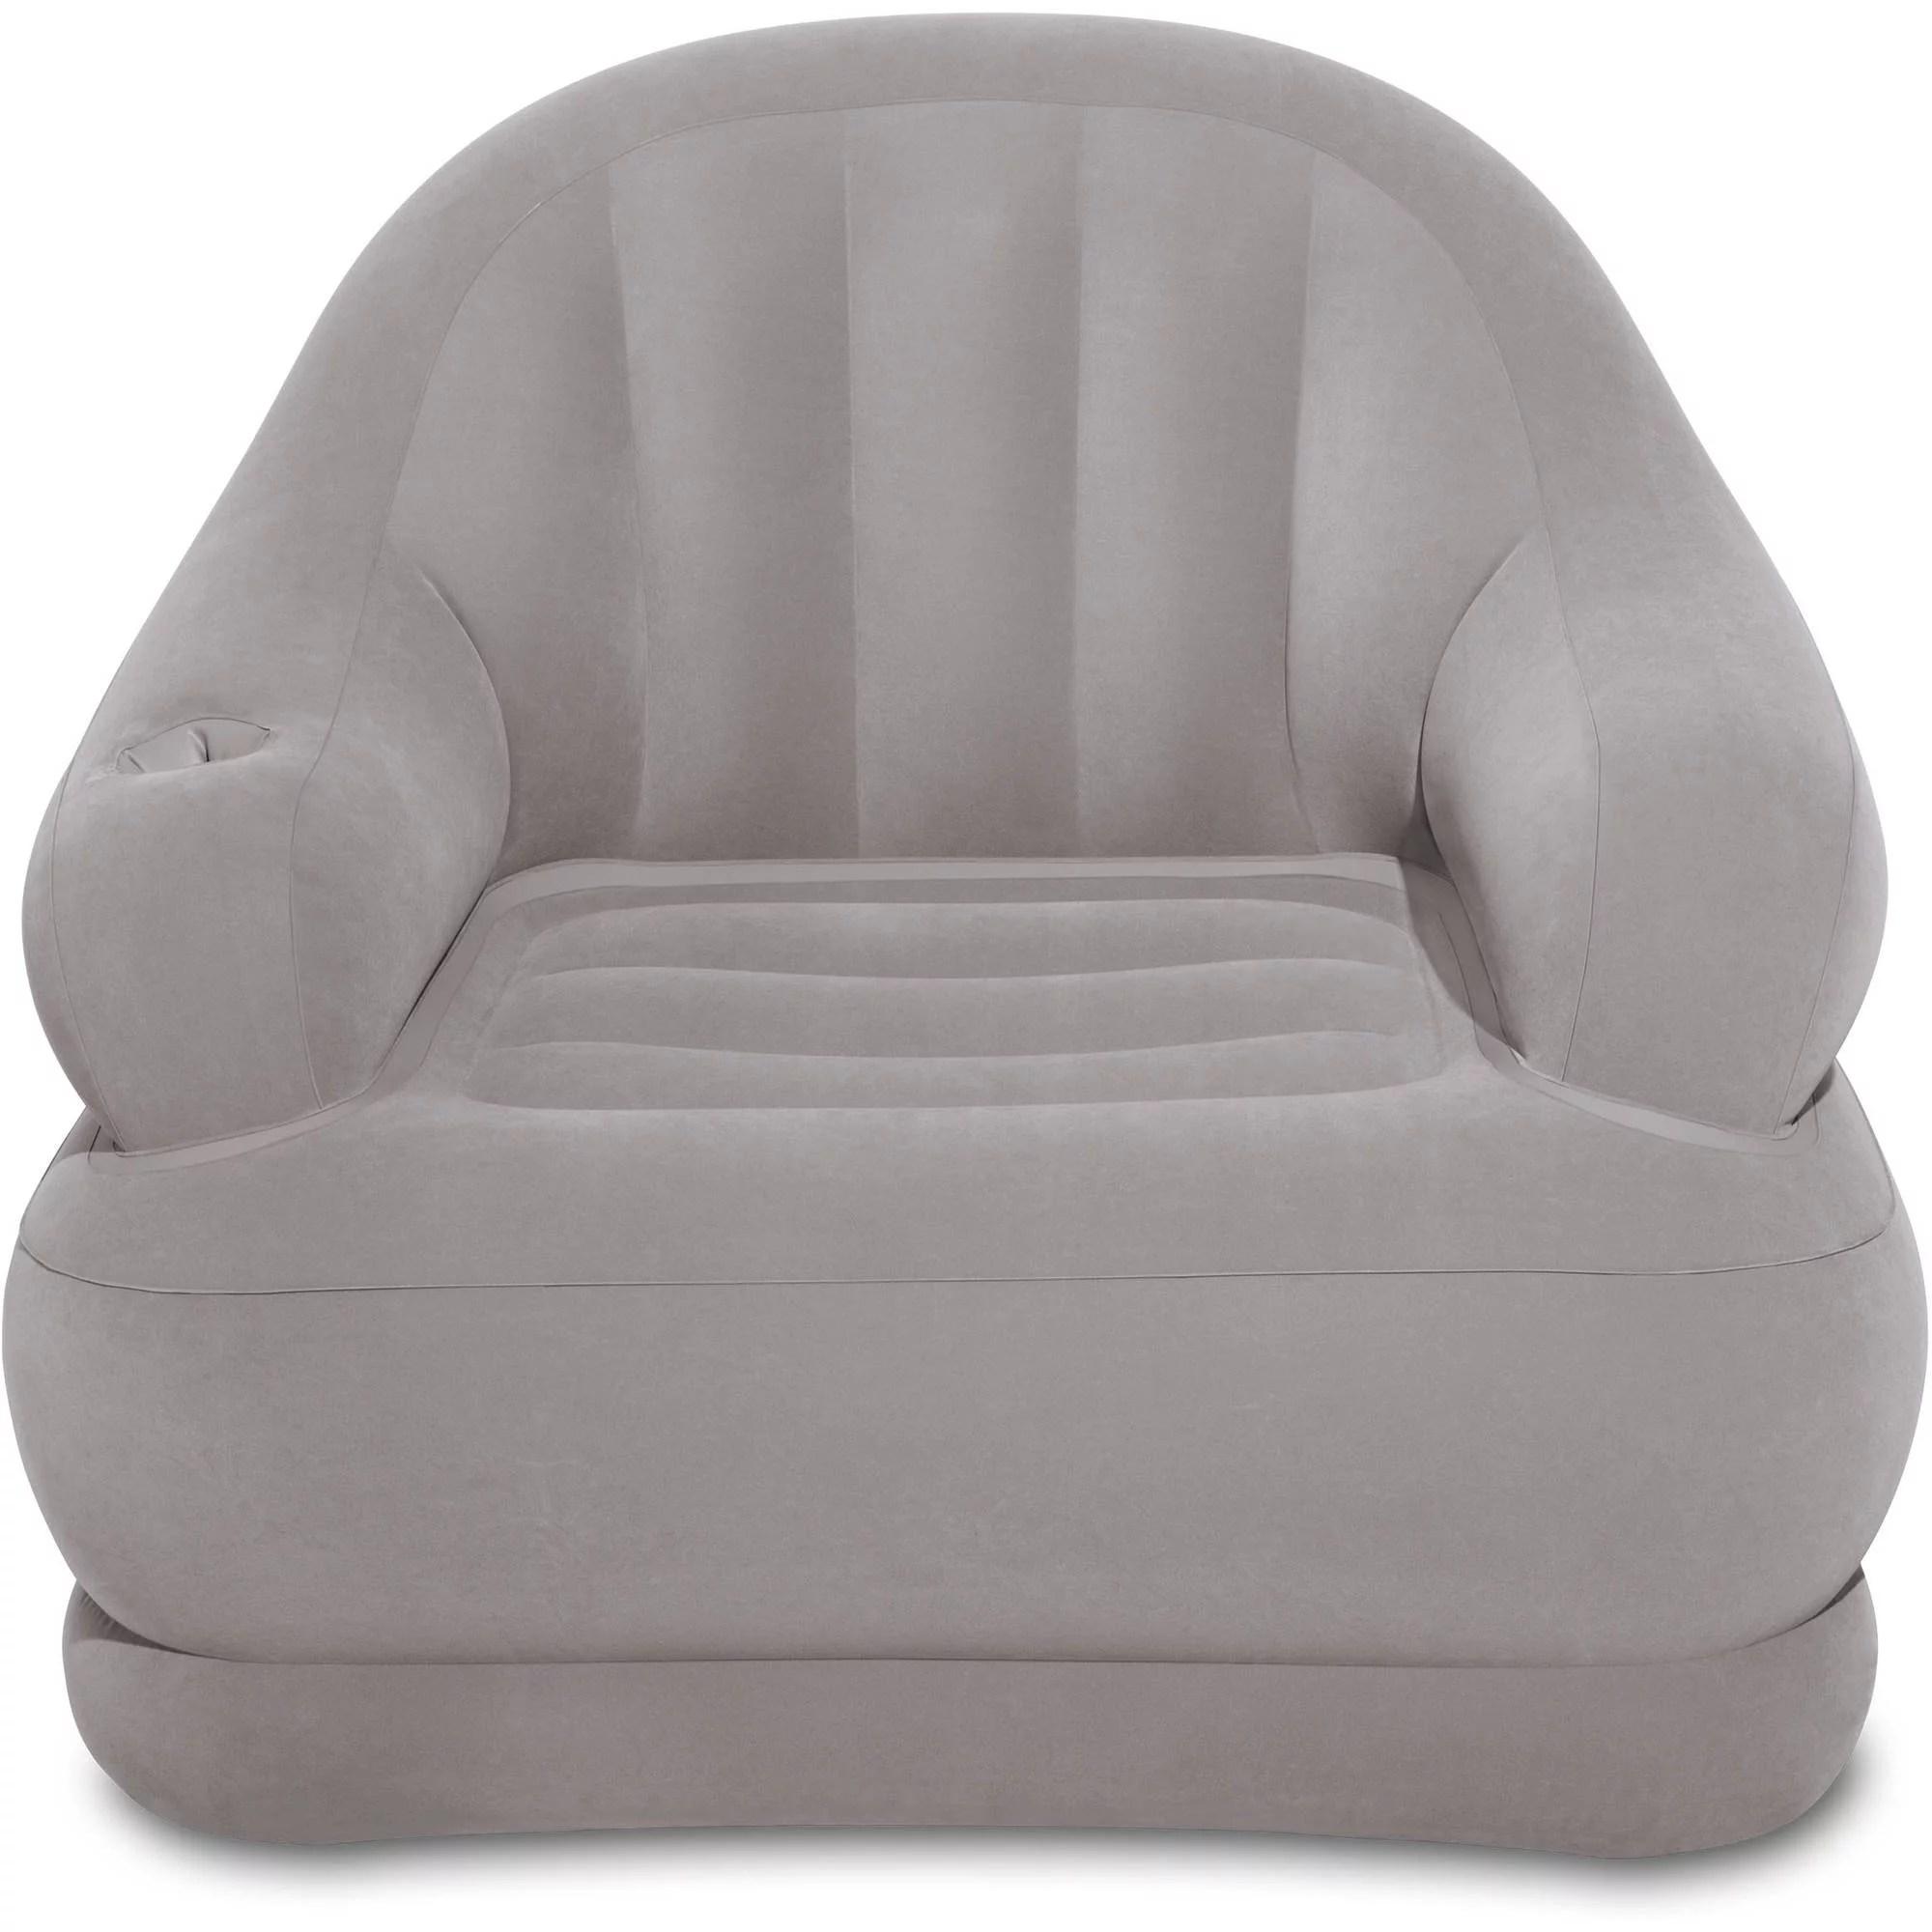 intex inflatable chairs folding deck b q camping chair 48 x 44 39 walmart com